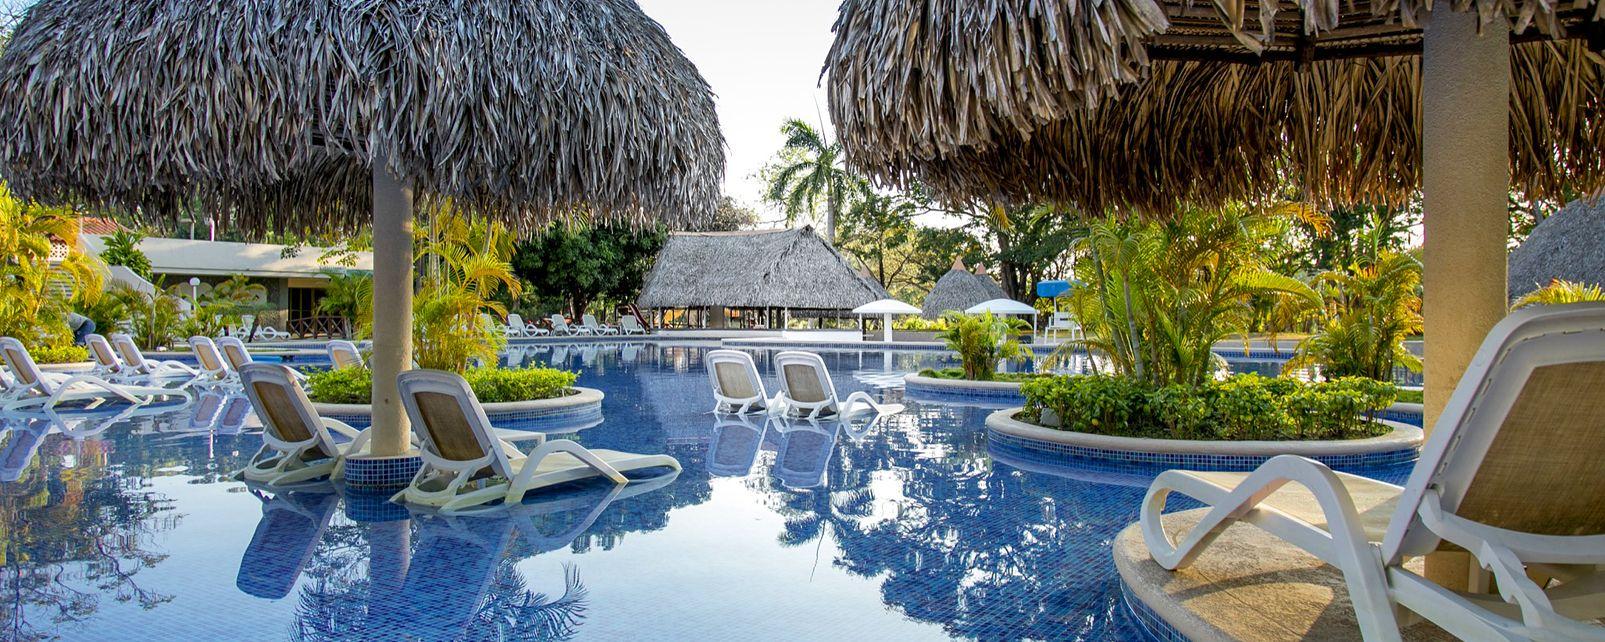 Club Coralia Coronado Panama 4*